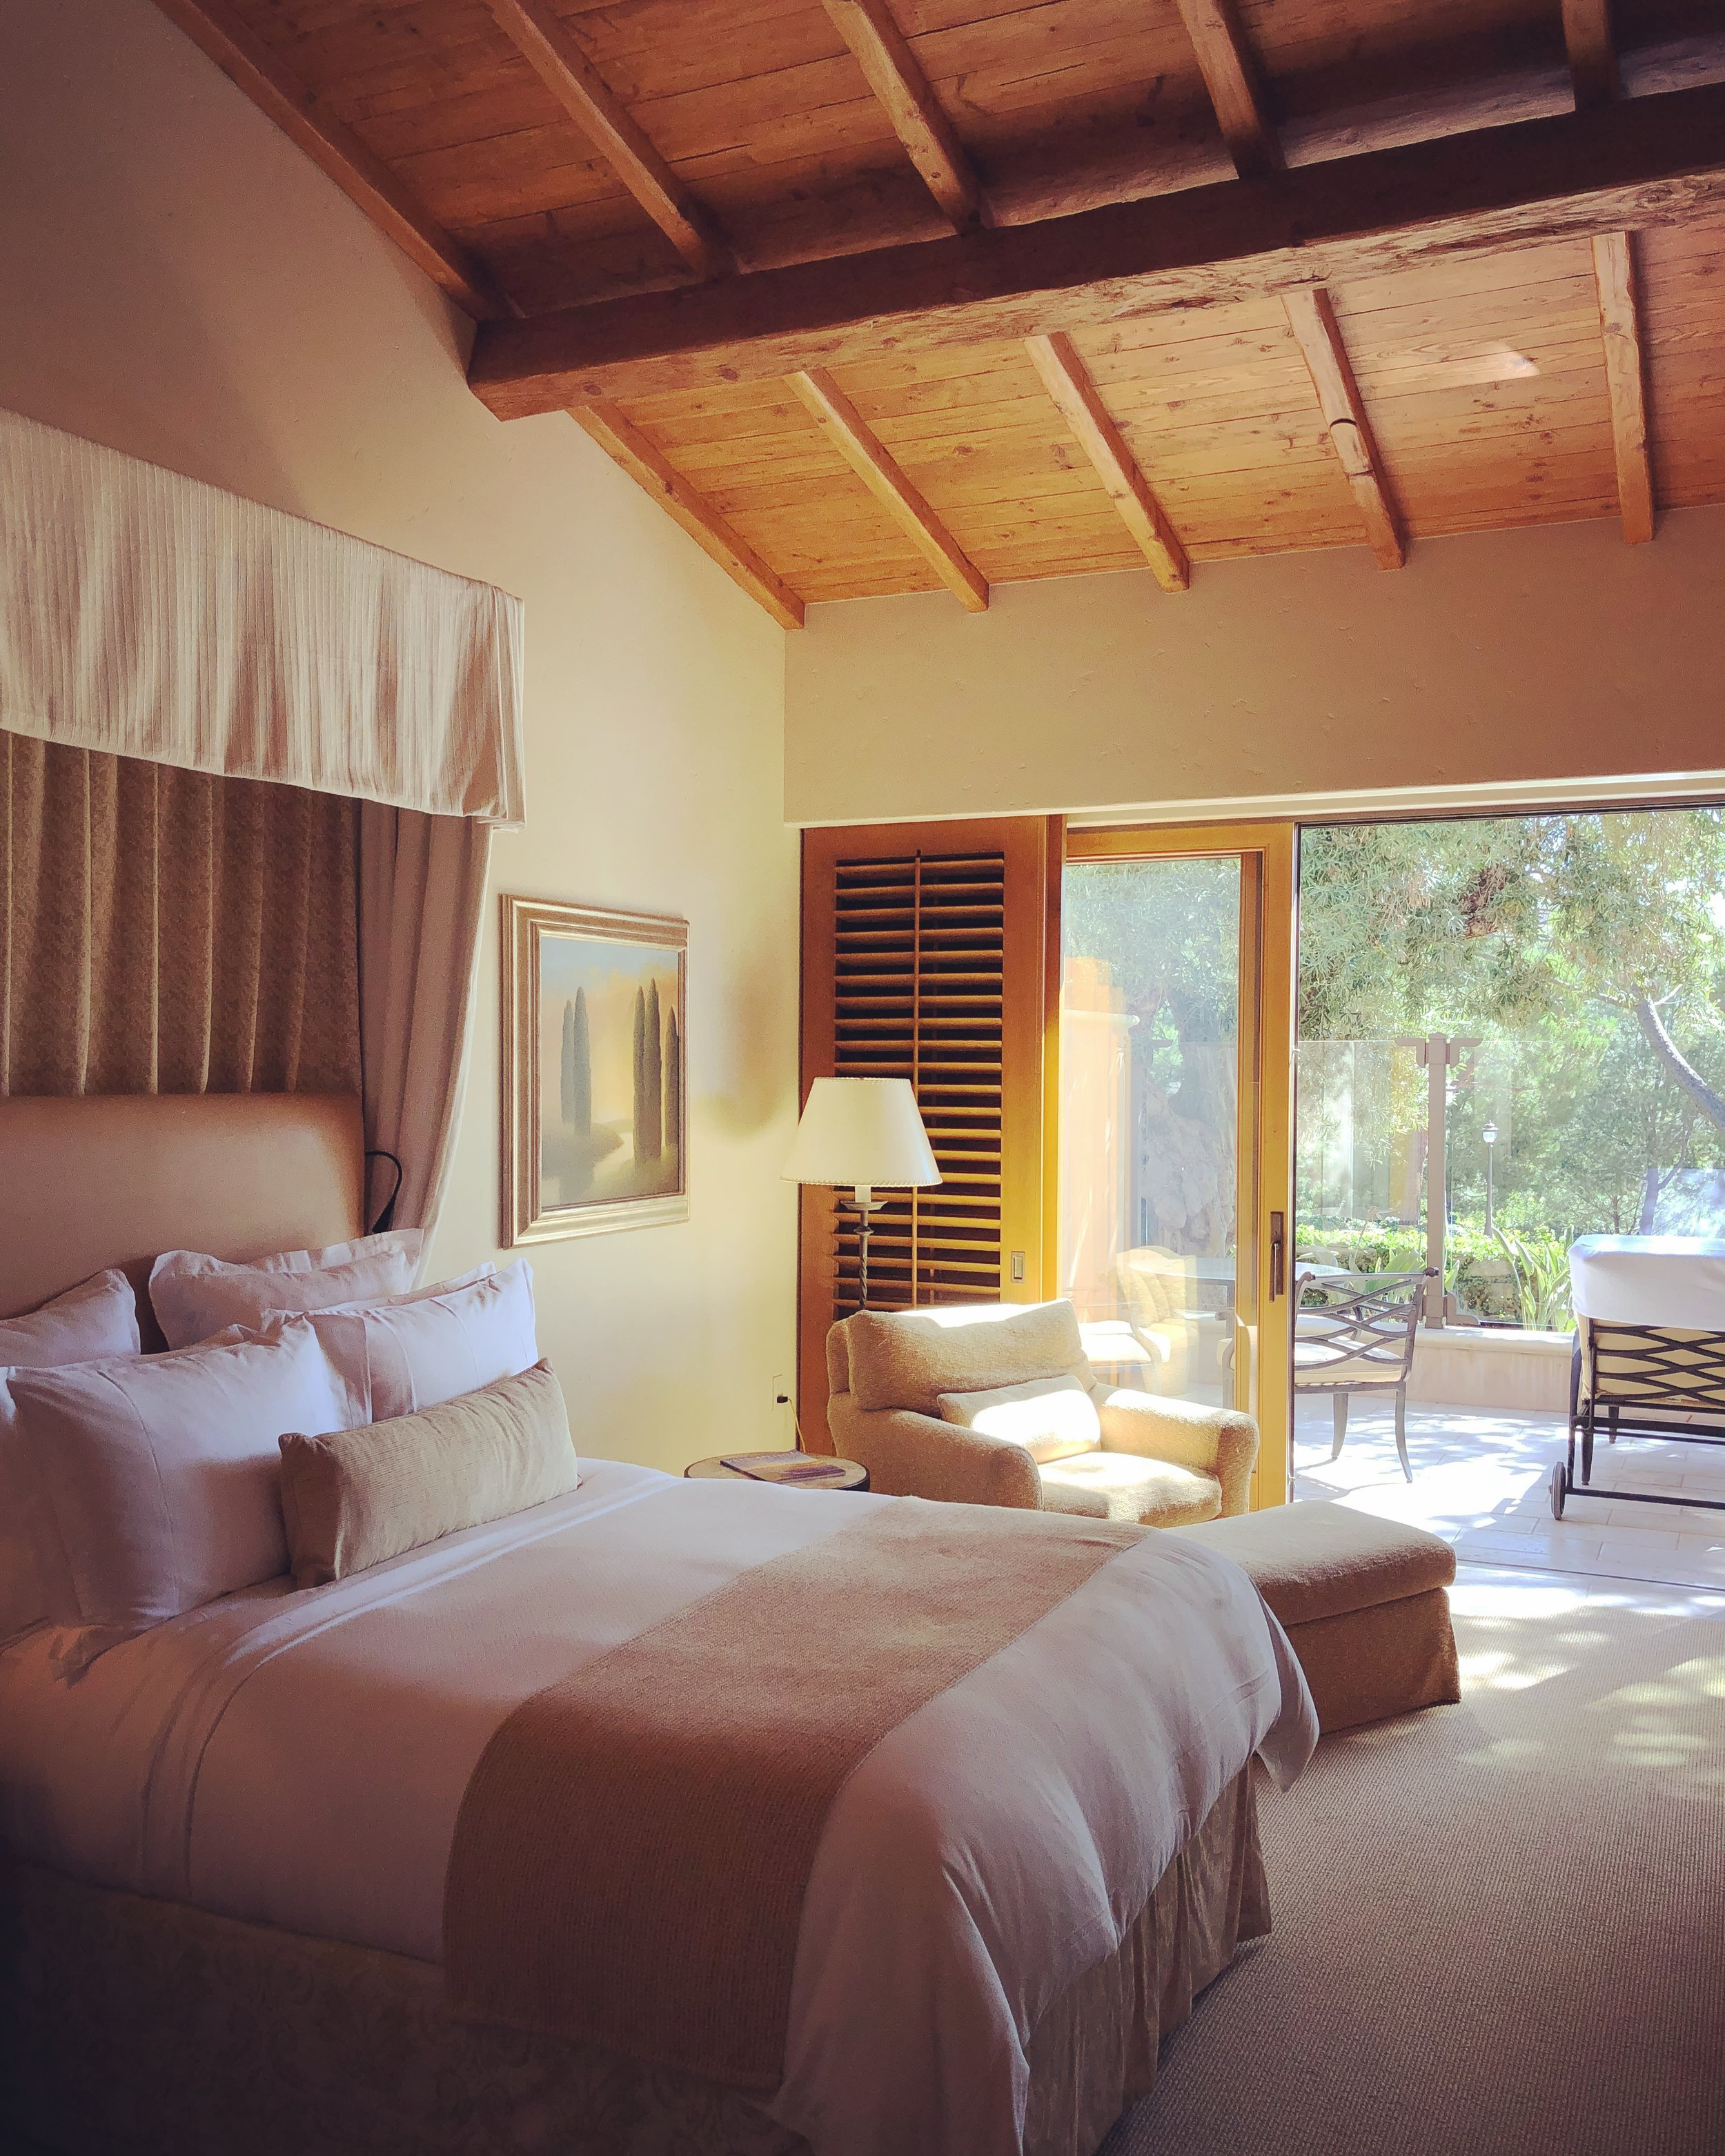 wanderlust-travel-blog-pelican-hill-bungalow